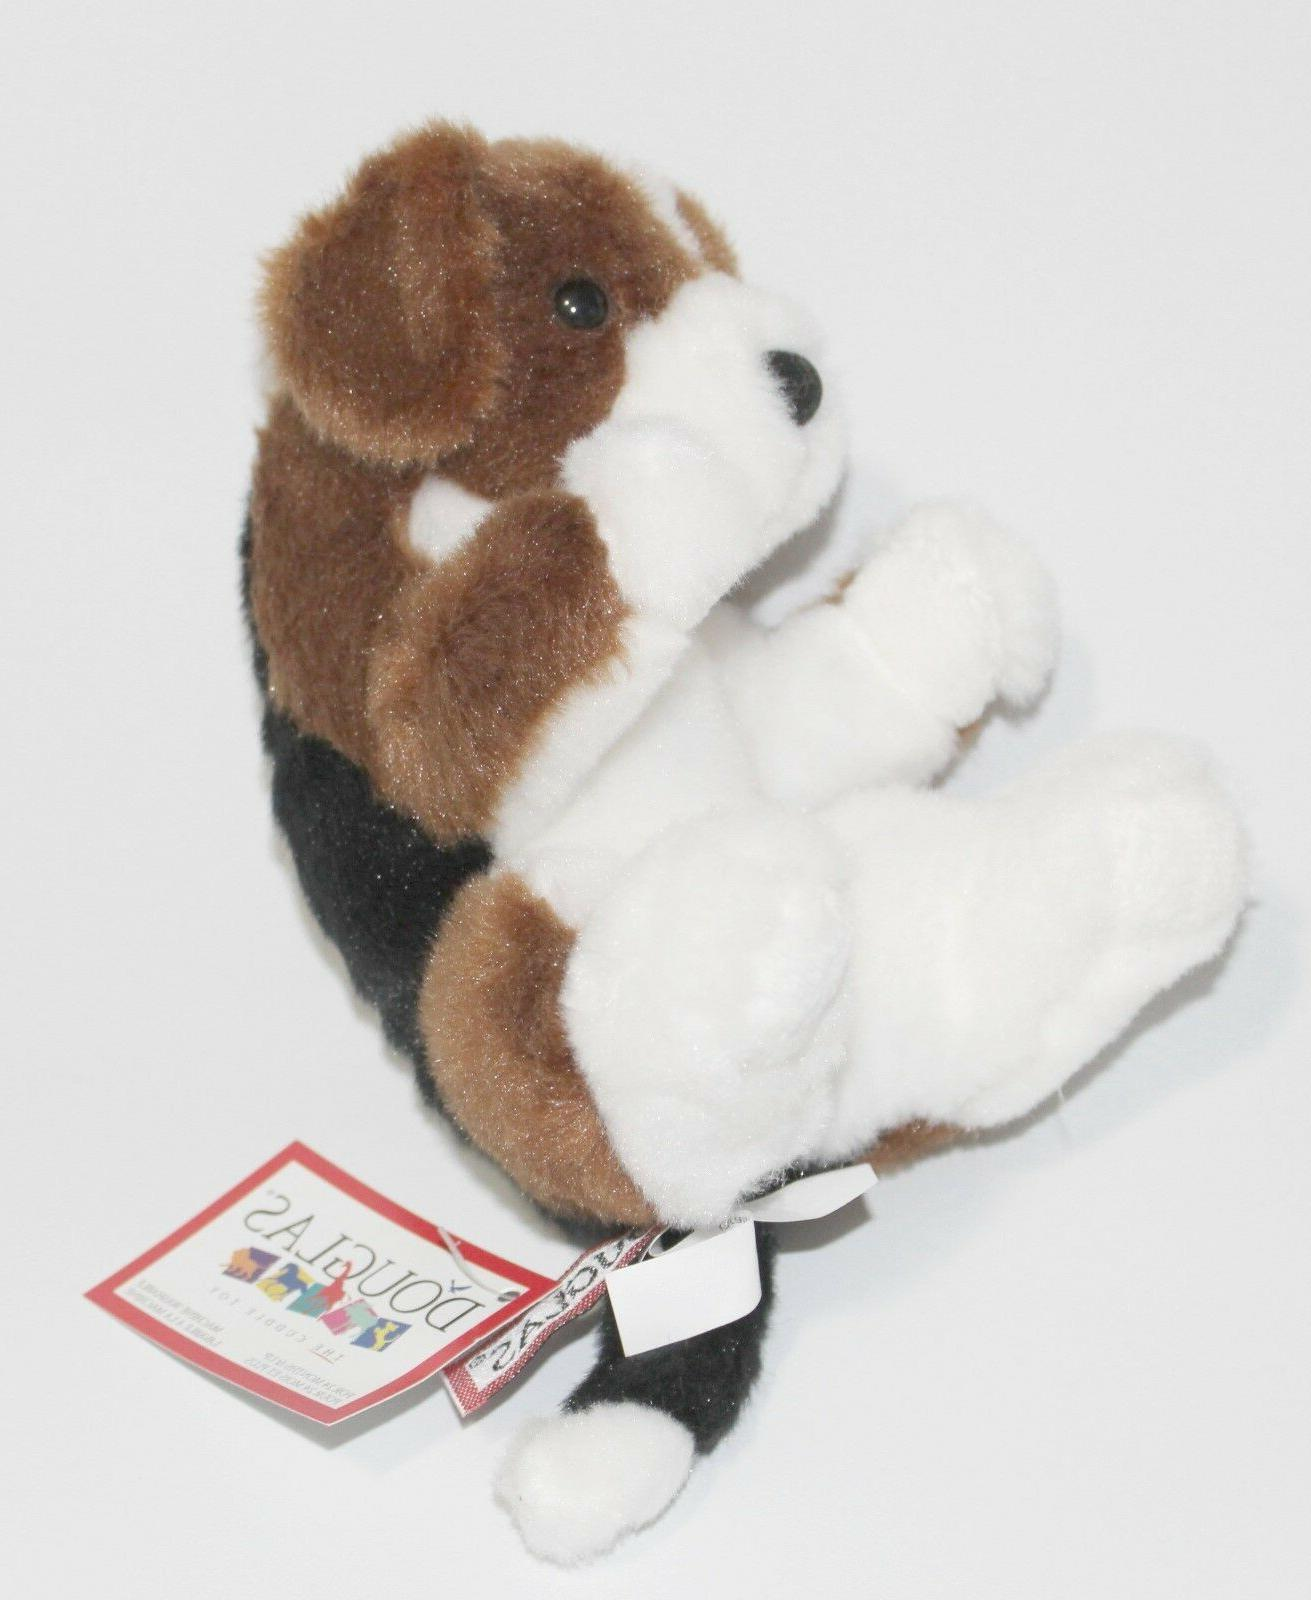 Douglas Lil Stuffed Animal